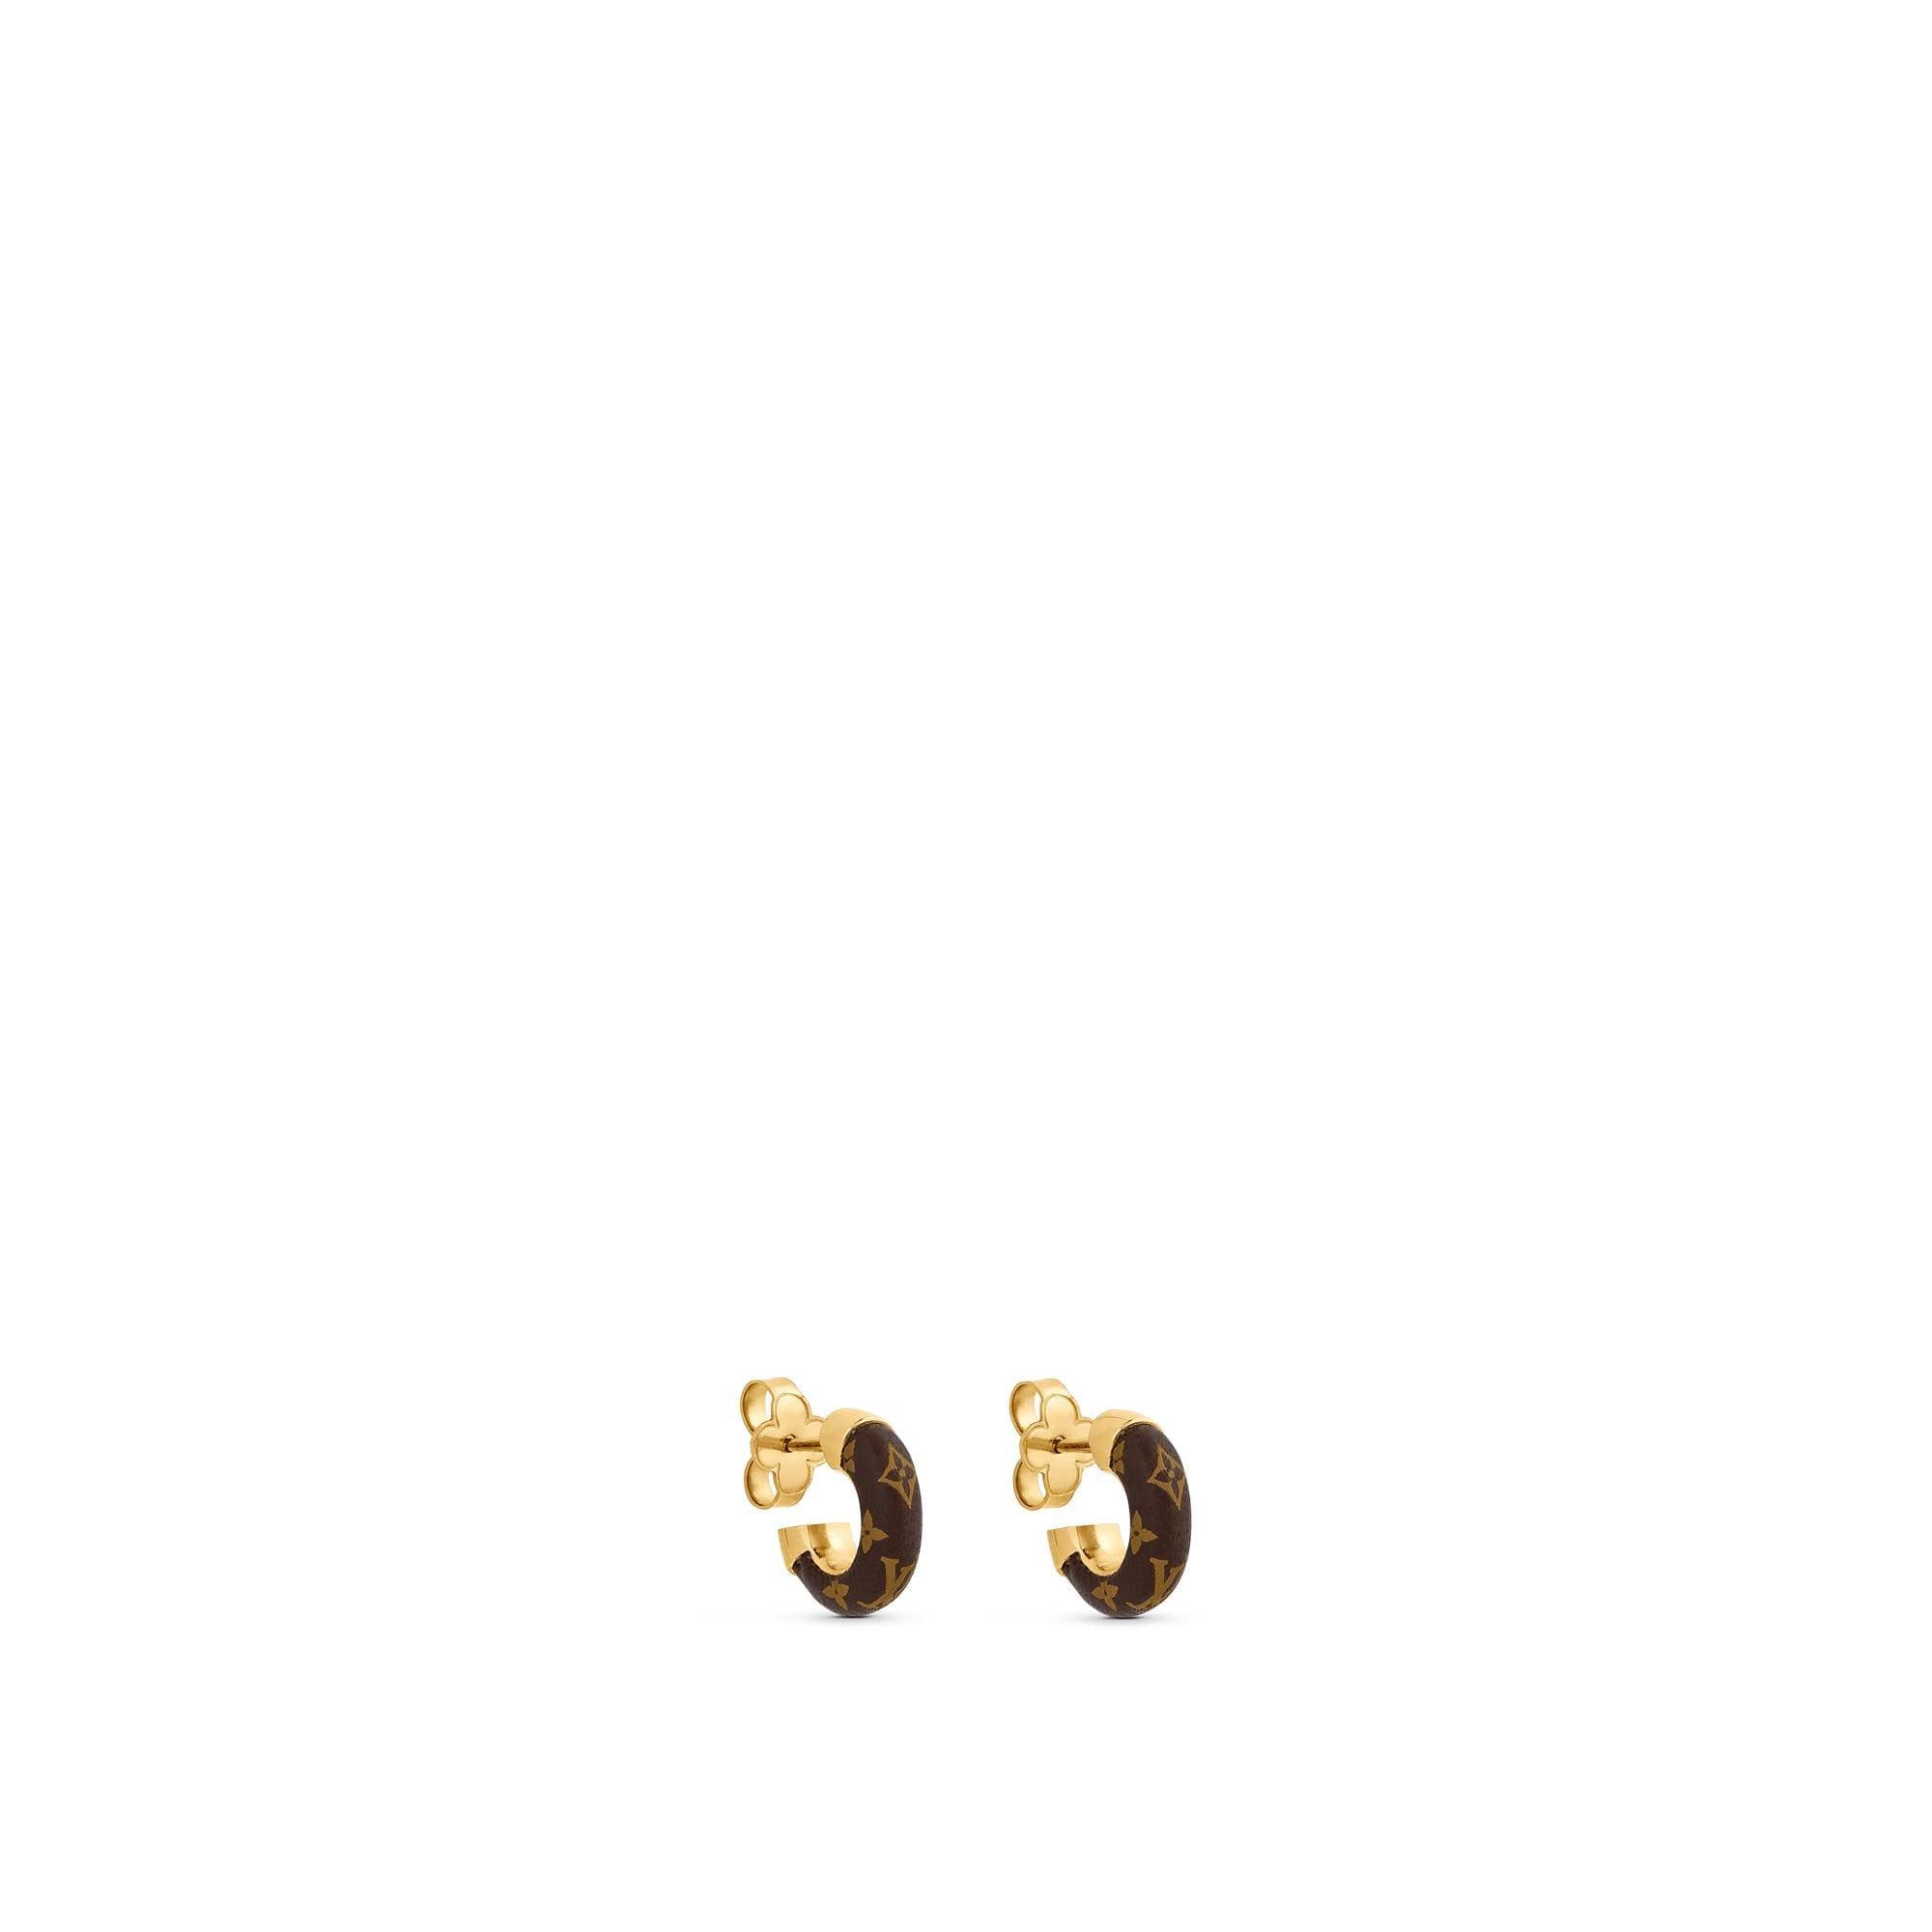 Wild LV Mini Hoop Earrings - Accessories | LOUIS VUITTON ®